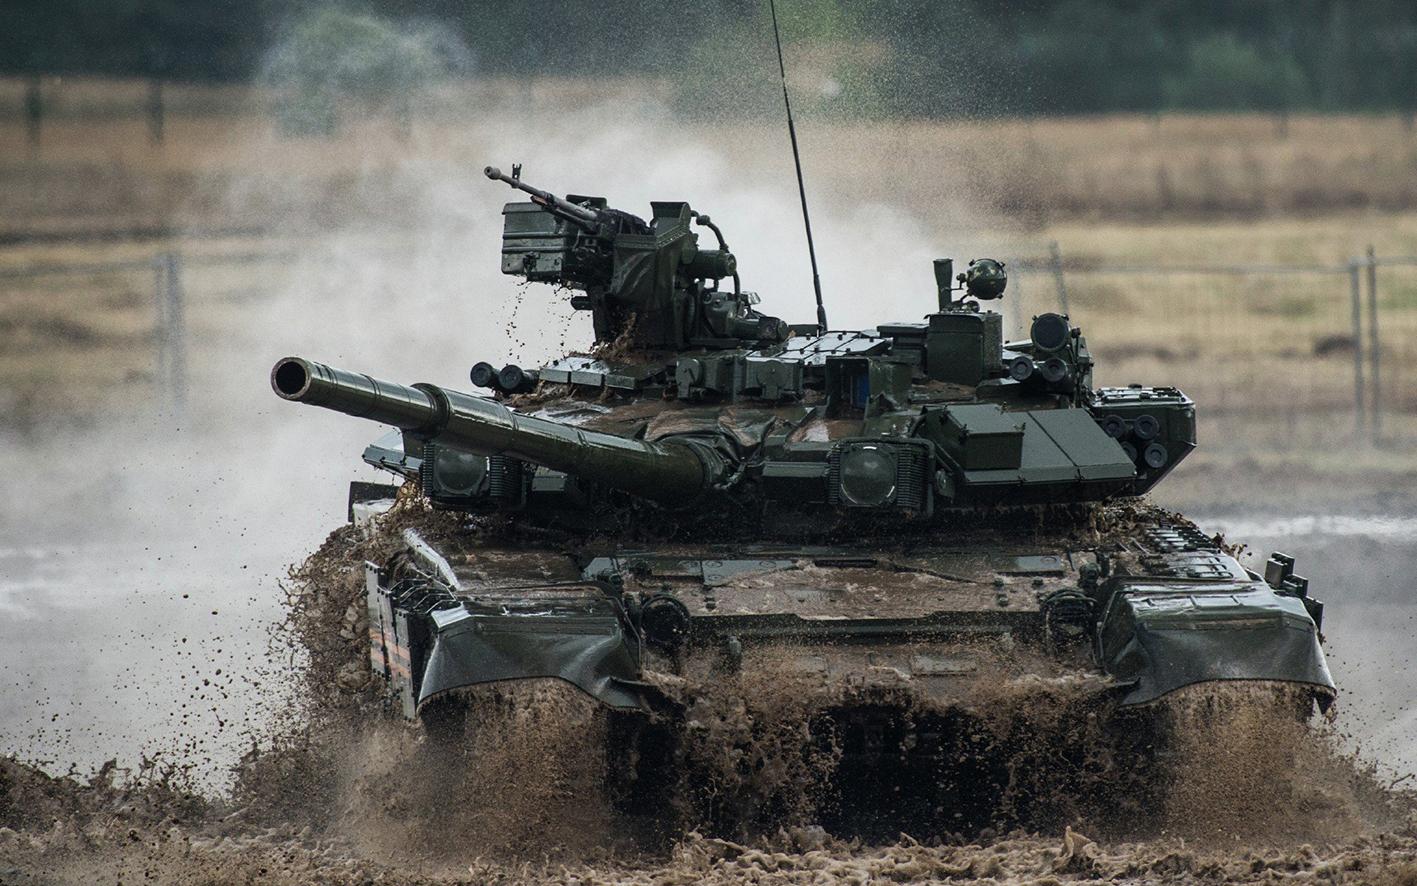 A T-90 main battle tank.